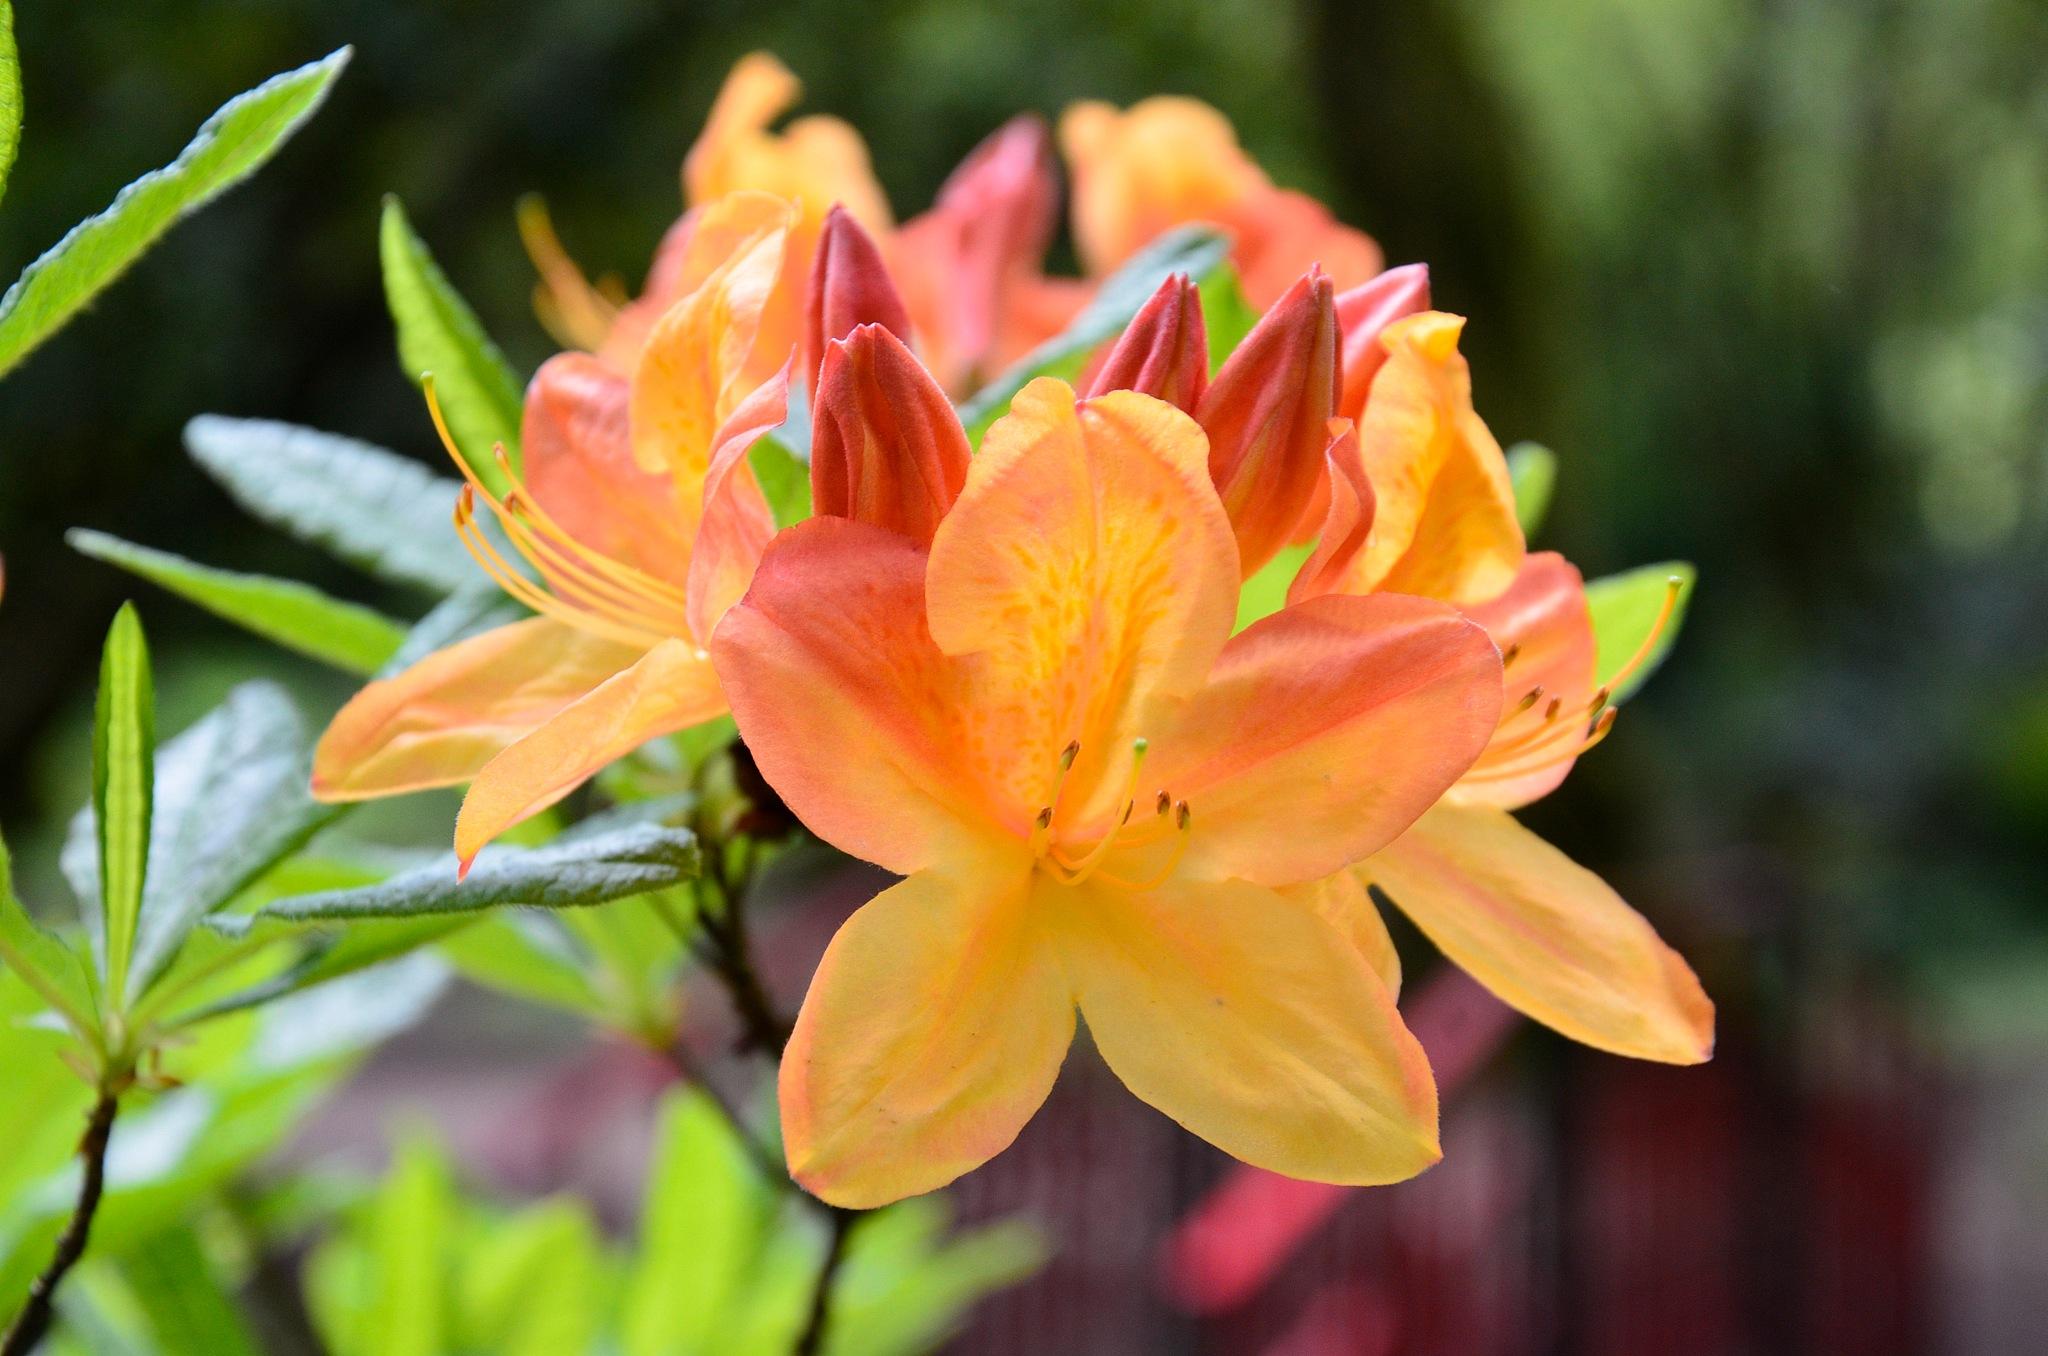 rhododendron by melaniehartshorn40